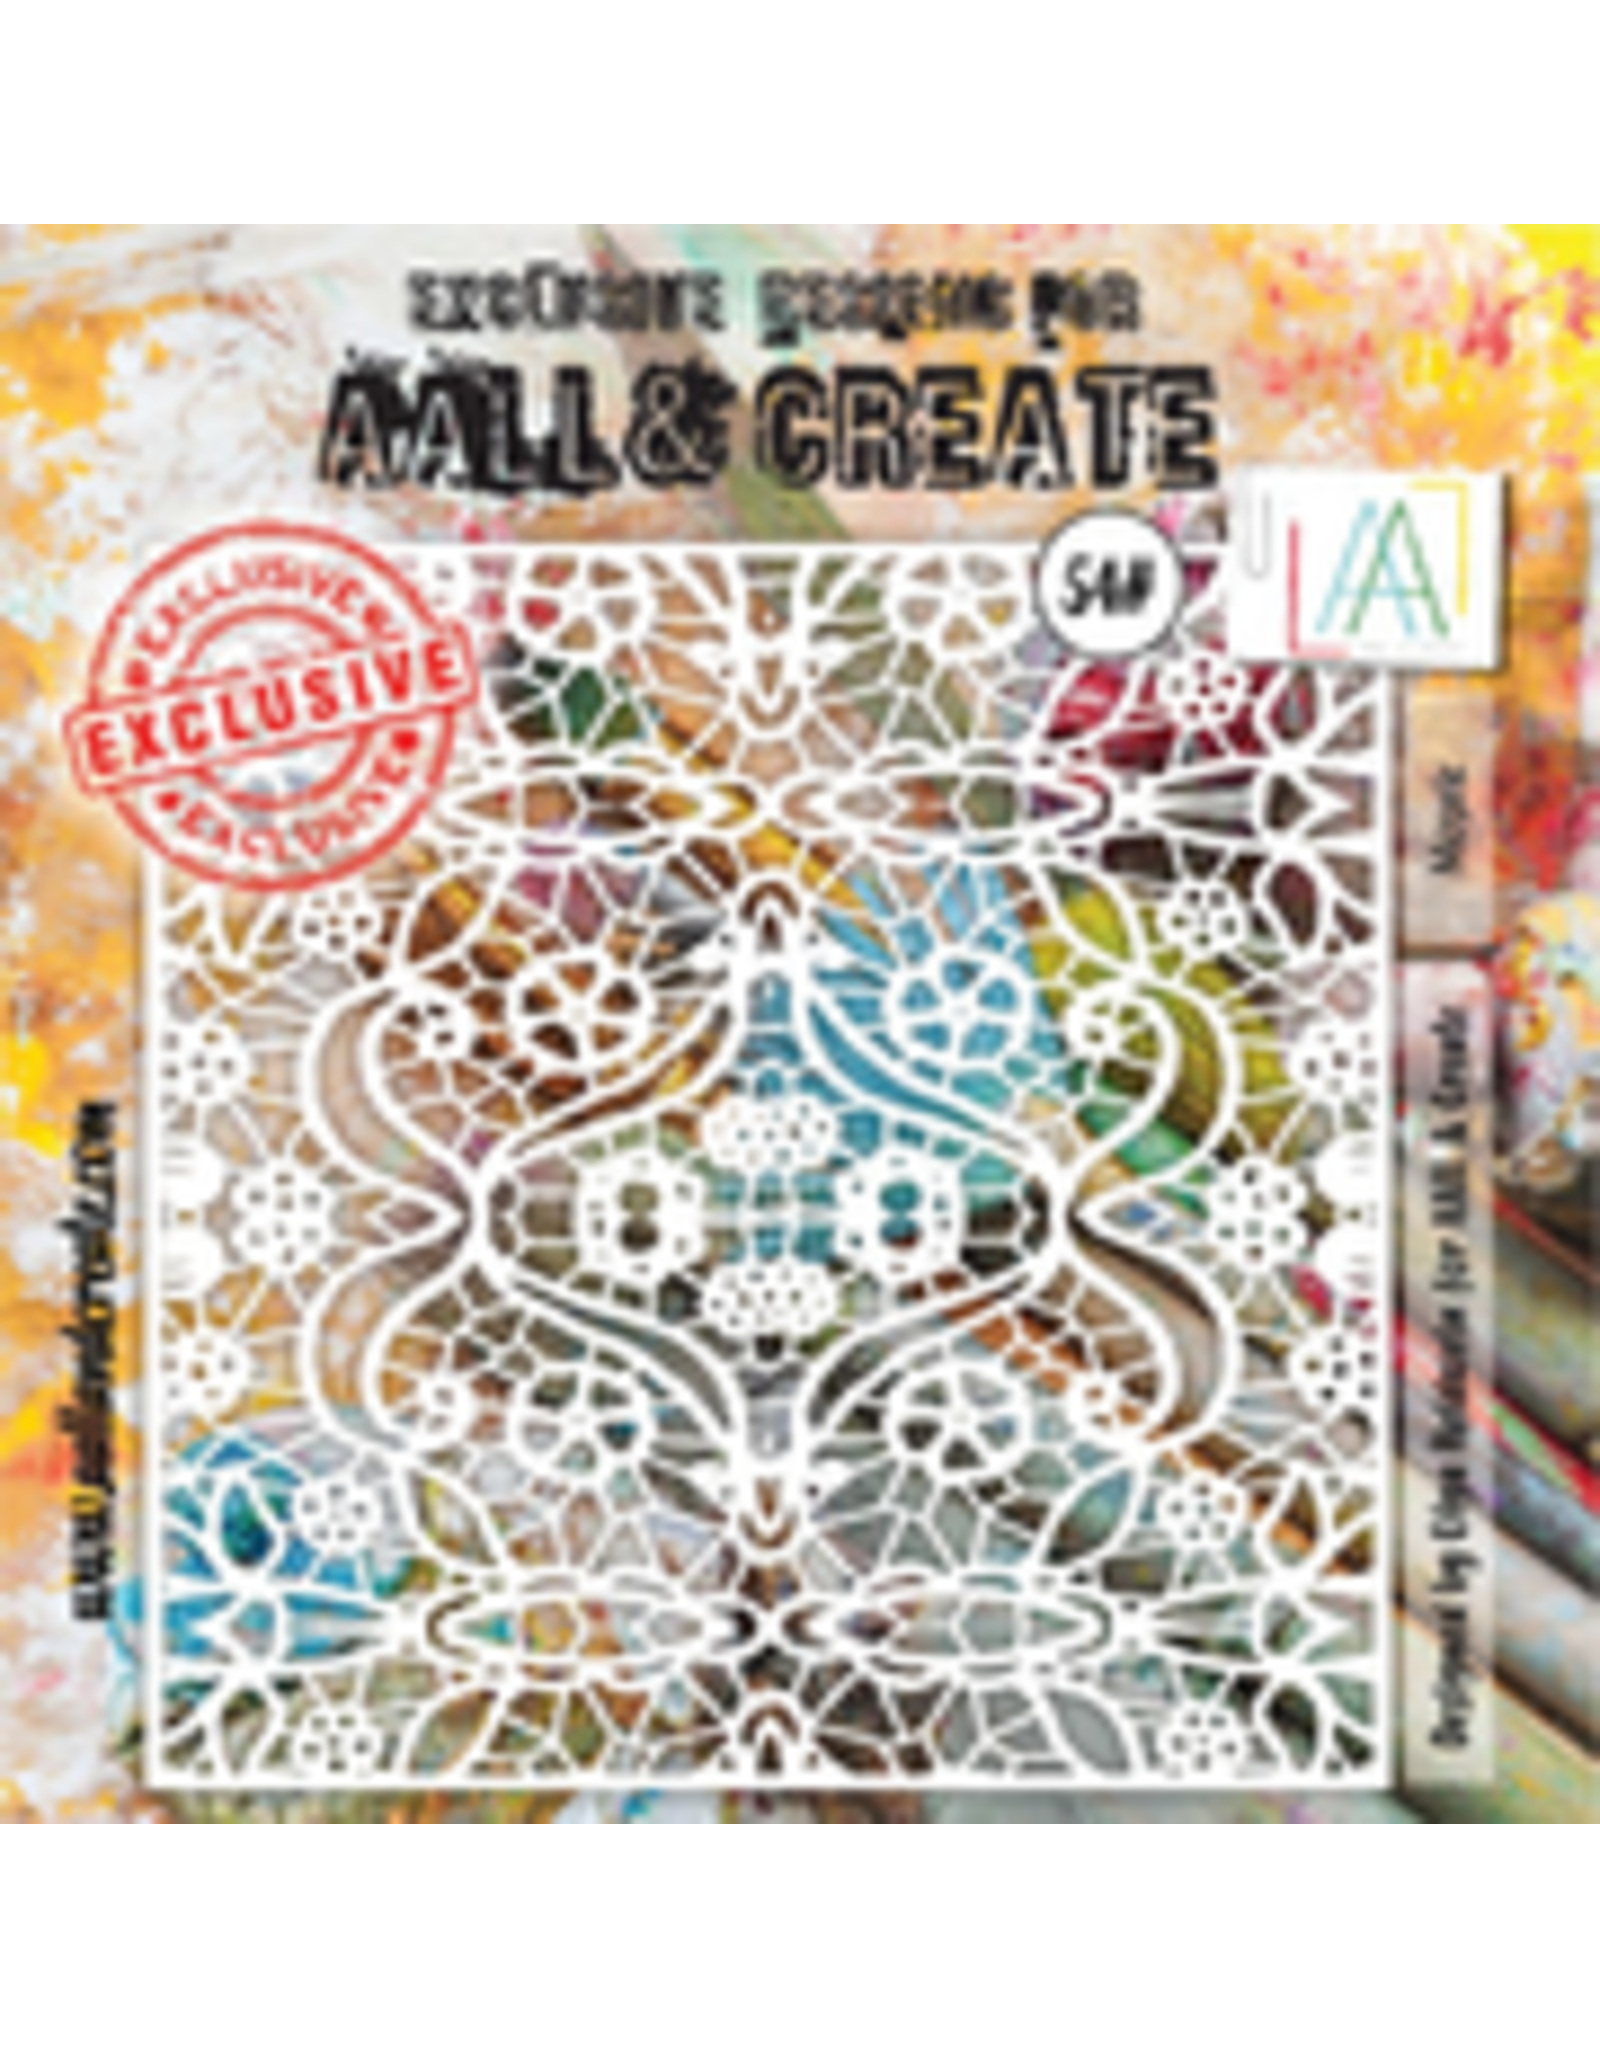 Aall& Create Aall & Create 6' x 6' stencil #54